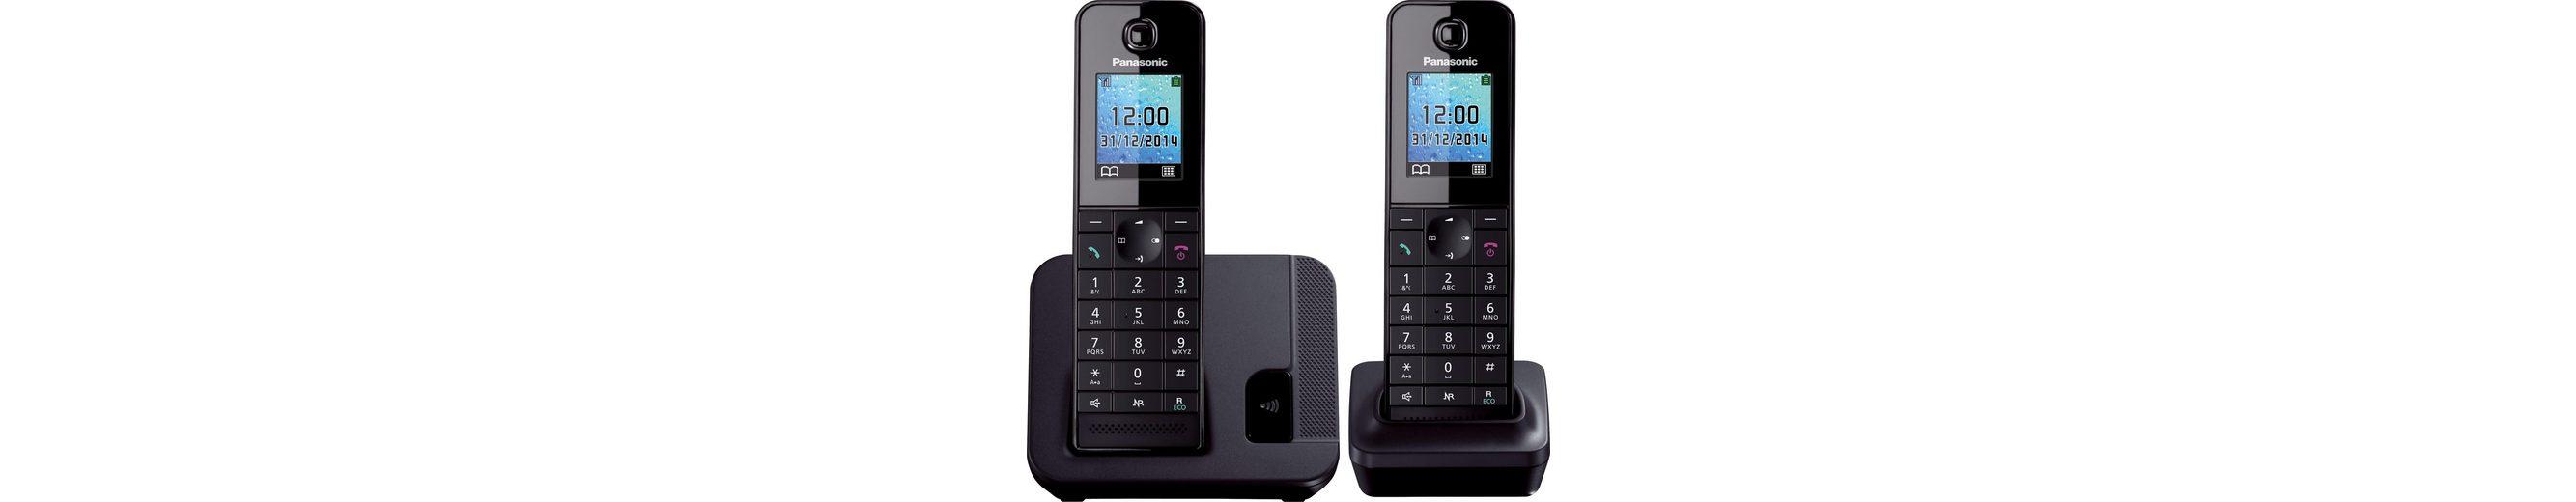 Panasonic KX-TGH212 DUO Schnurloses DECT Telefon-Set